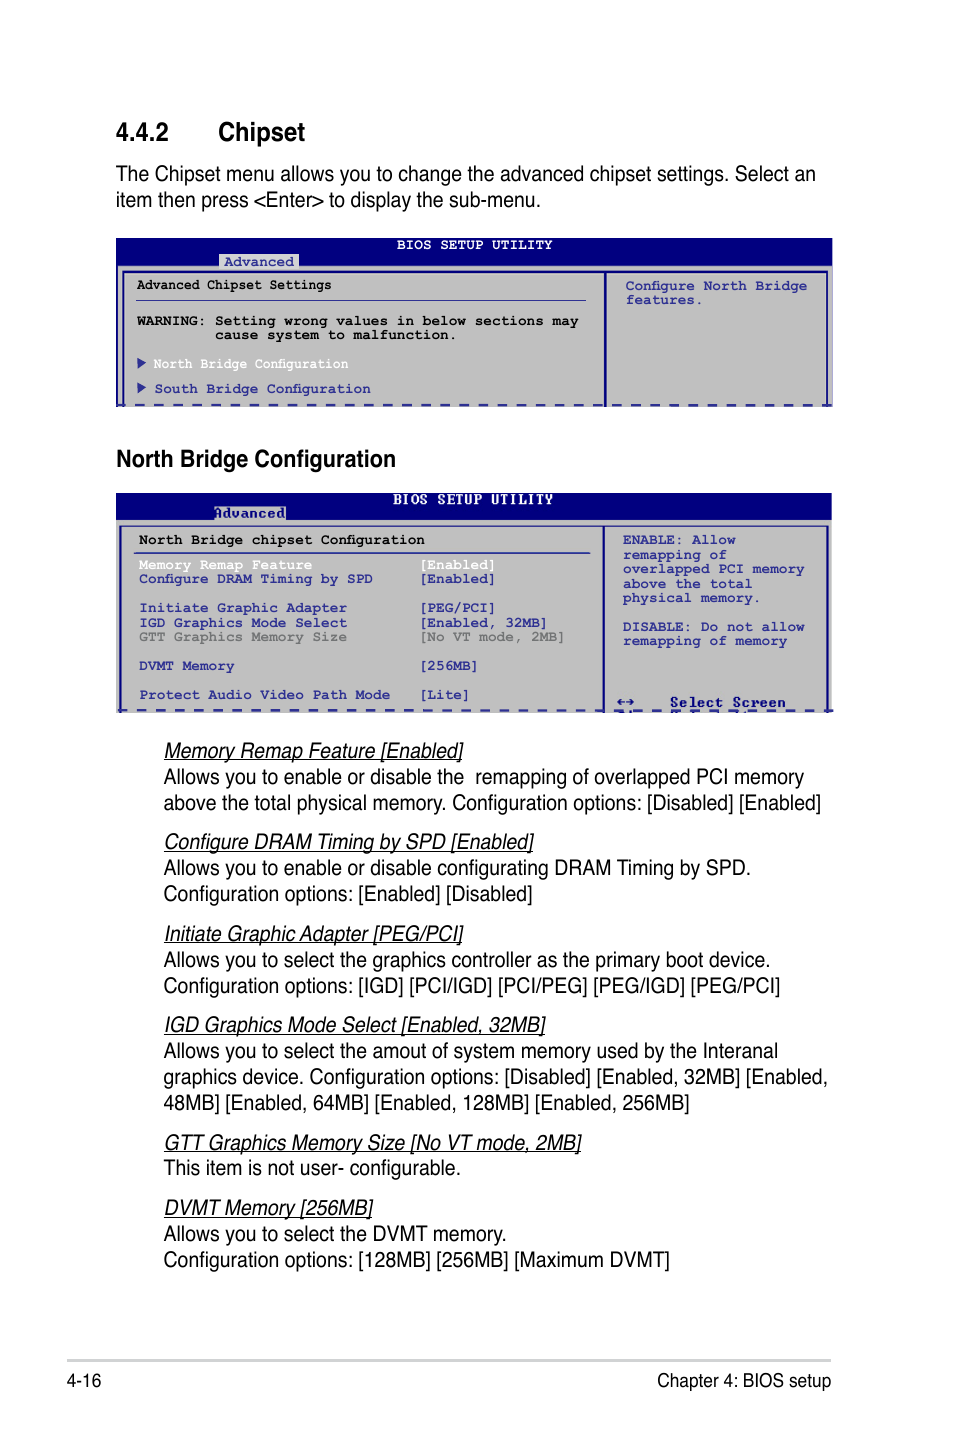 2 chipset, Chipset -16, North bridge configuration | Asus T5